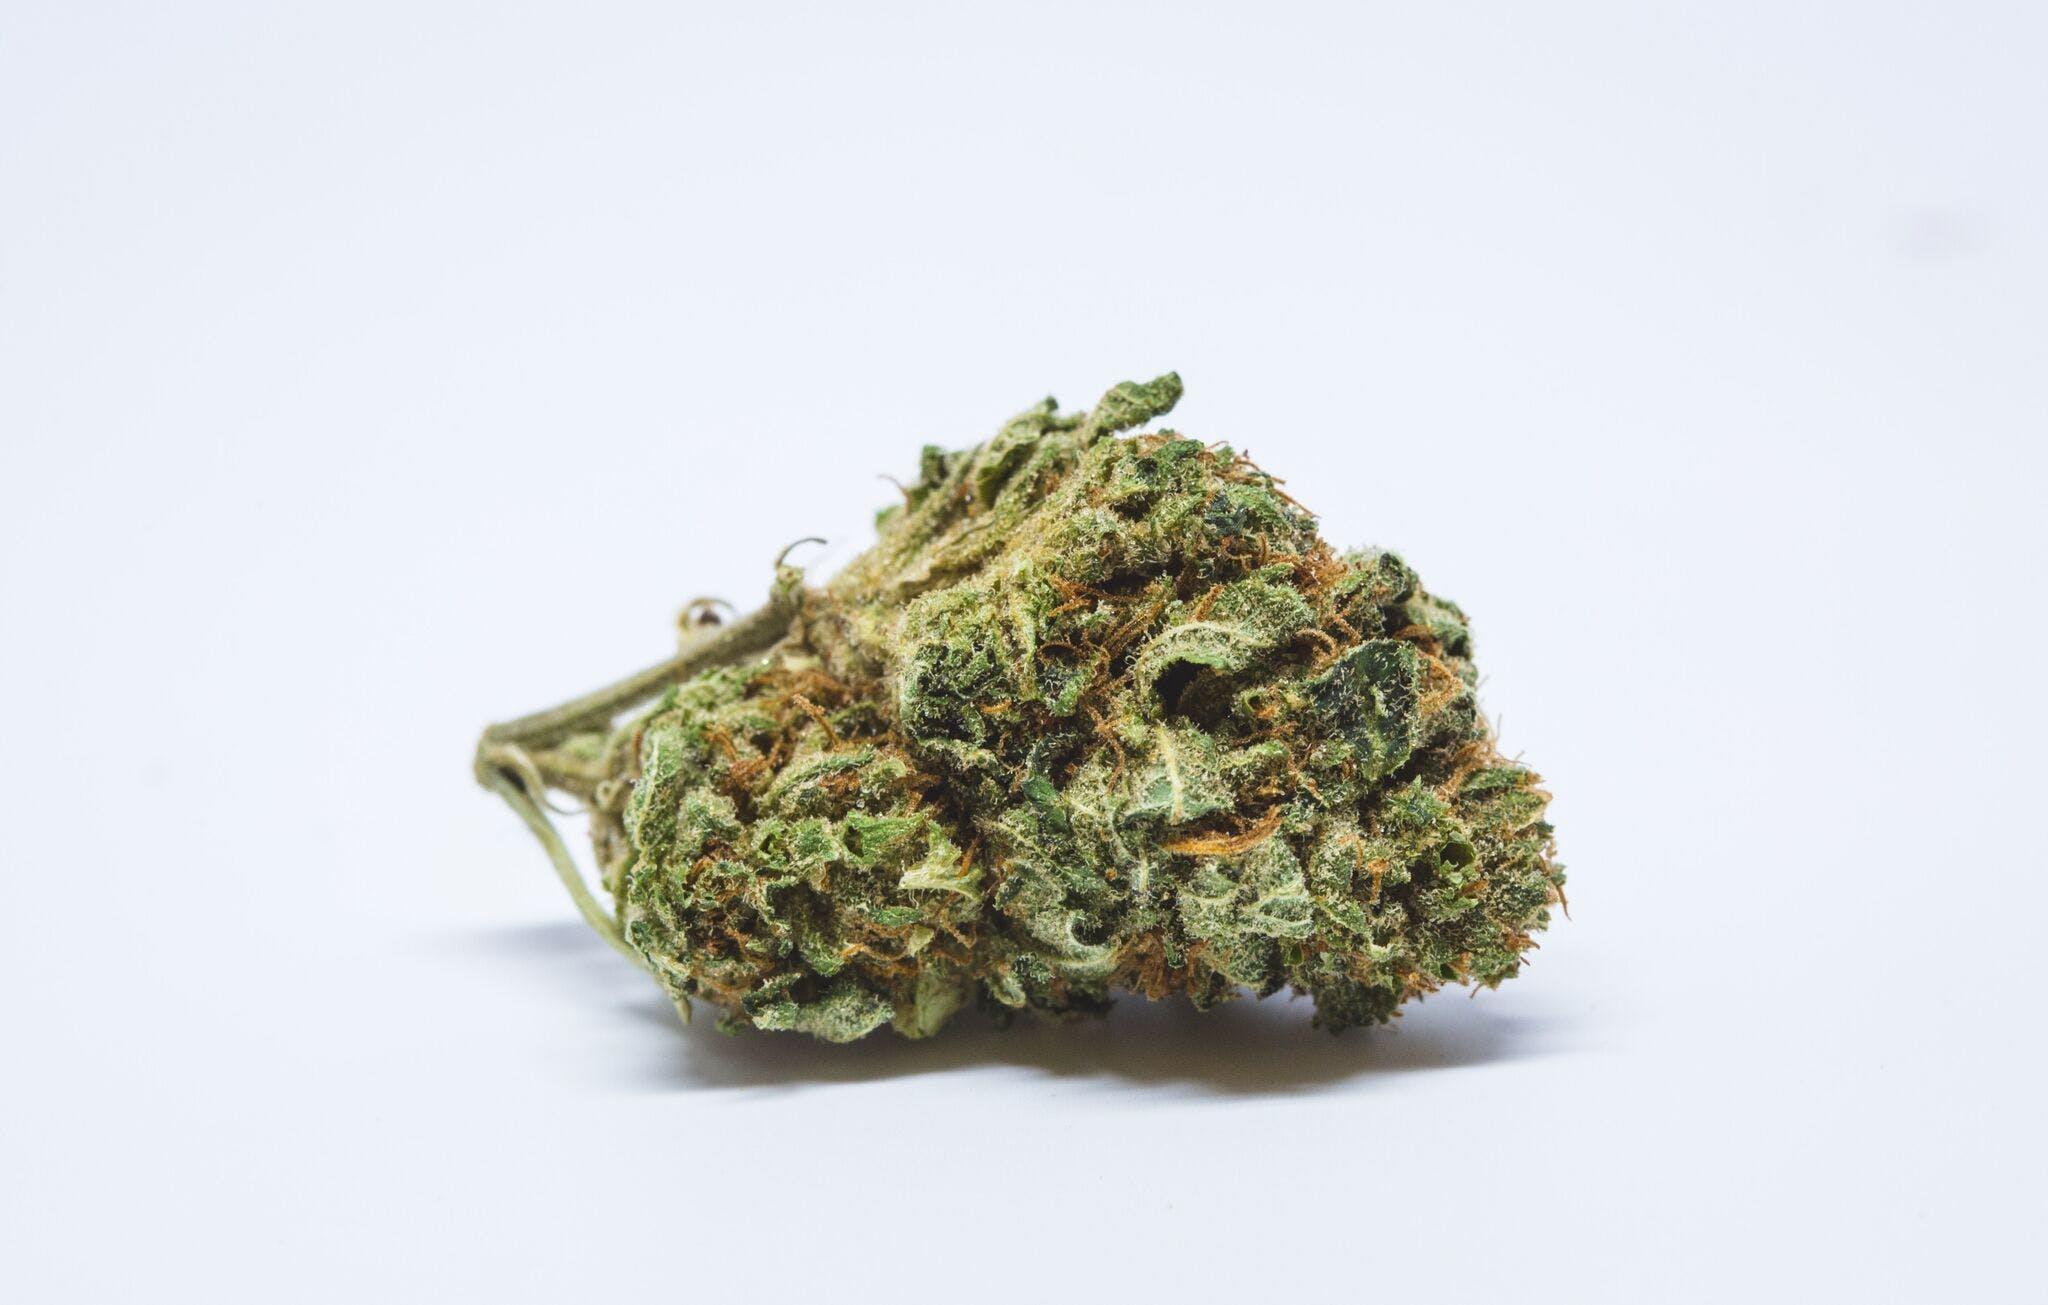 Candy Jack Weed; Candy Jack Cannabis Strain, Candy Jack Sativa Marijuana Strain